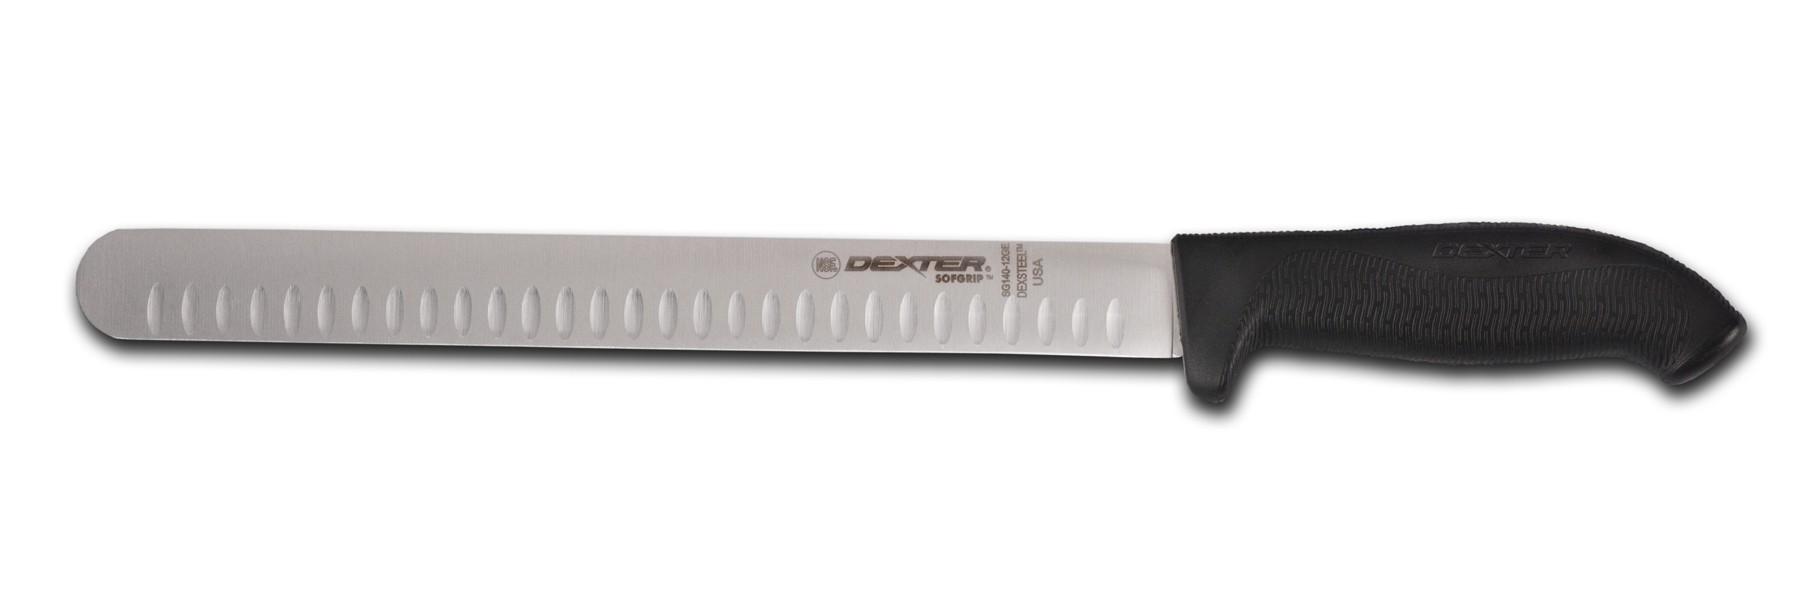 Dexter Russell 24273B slicer